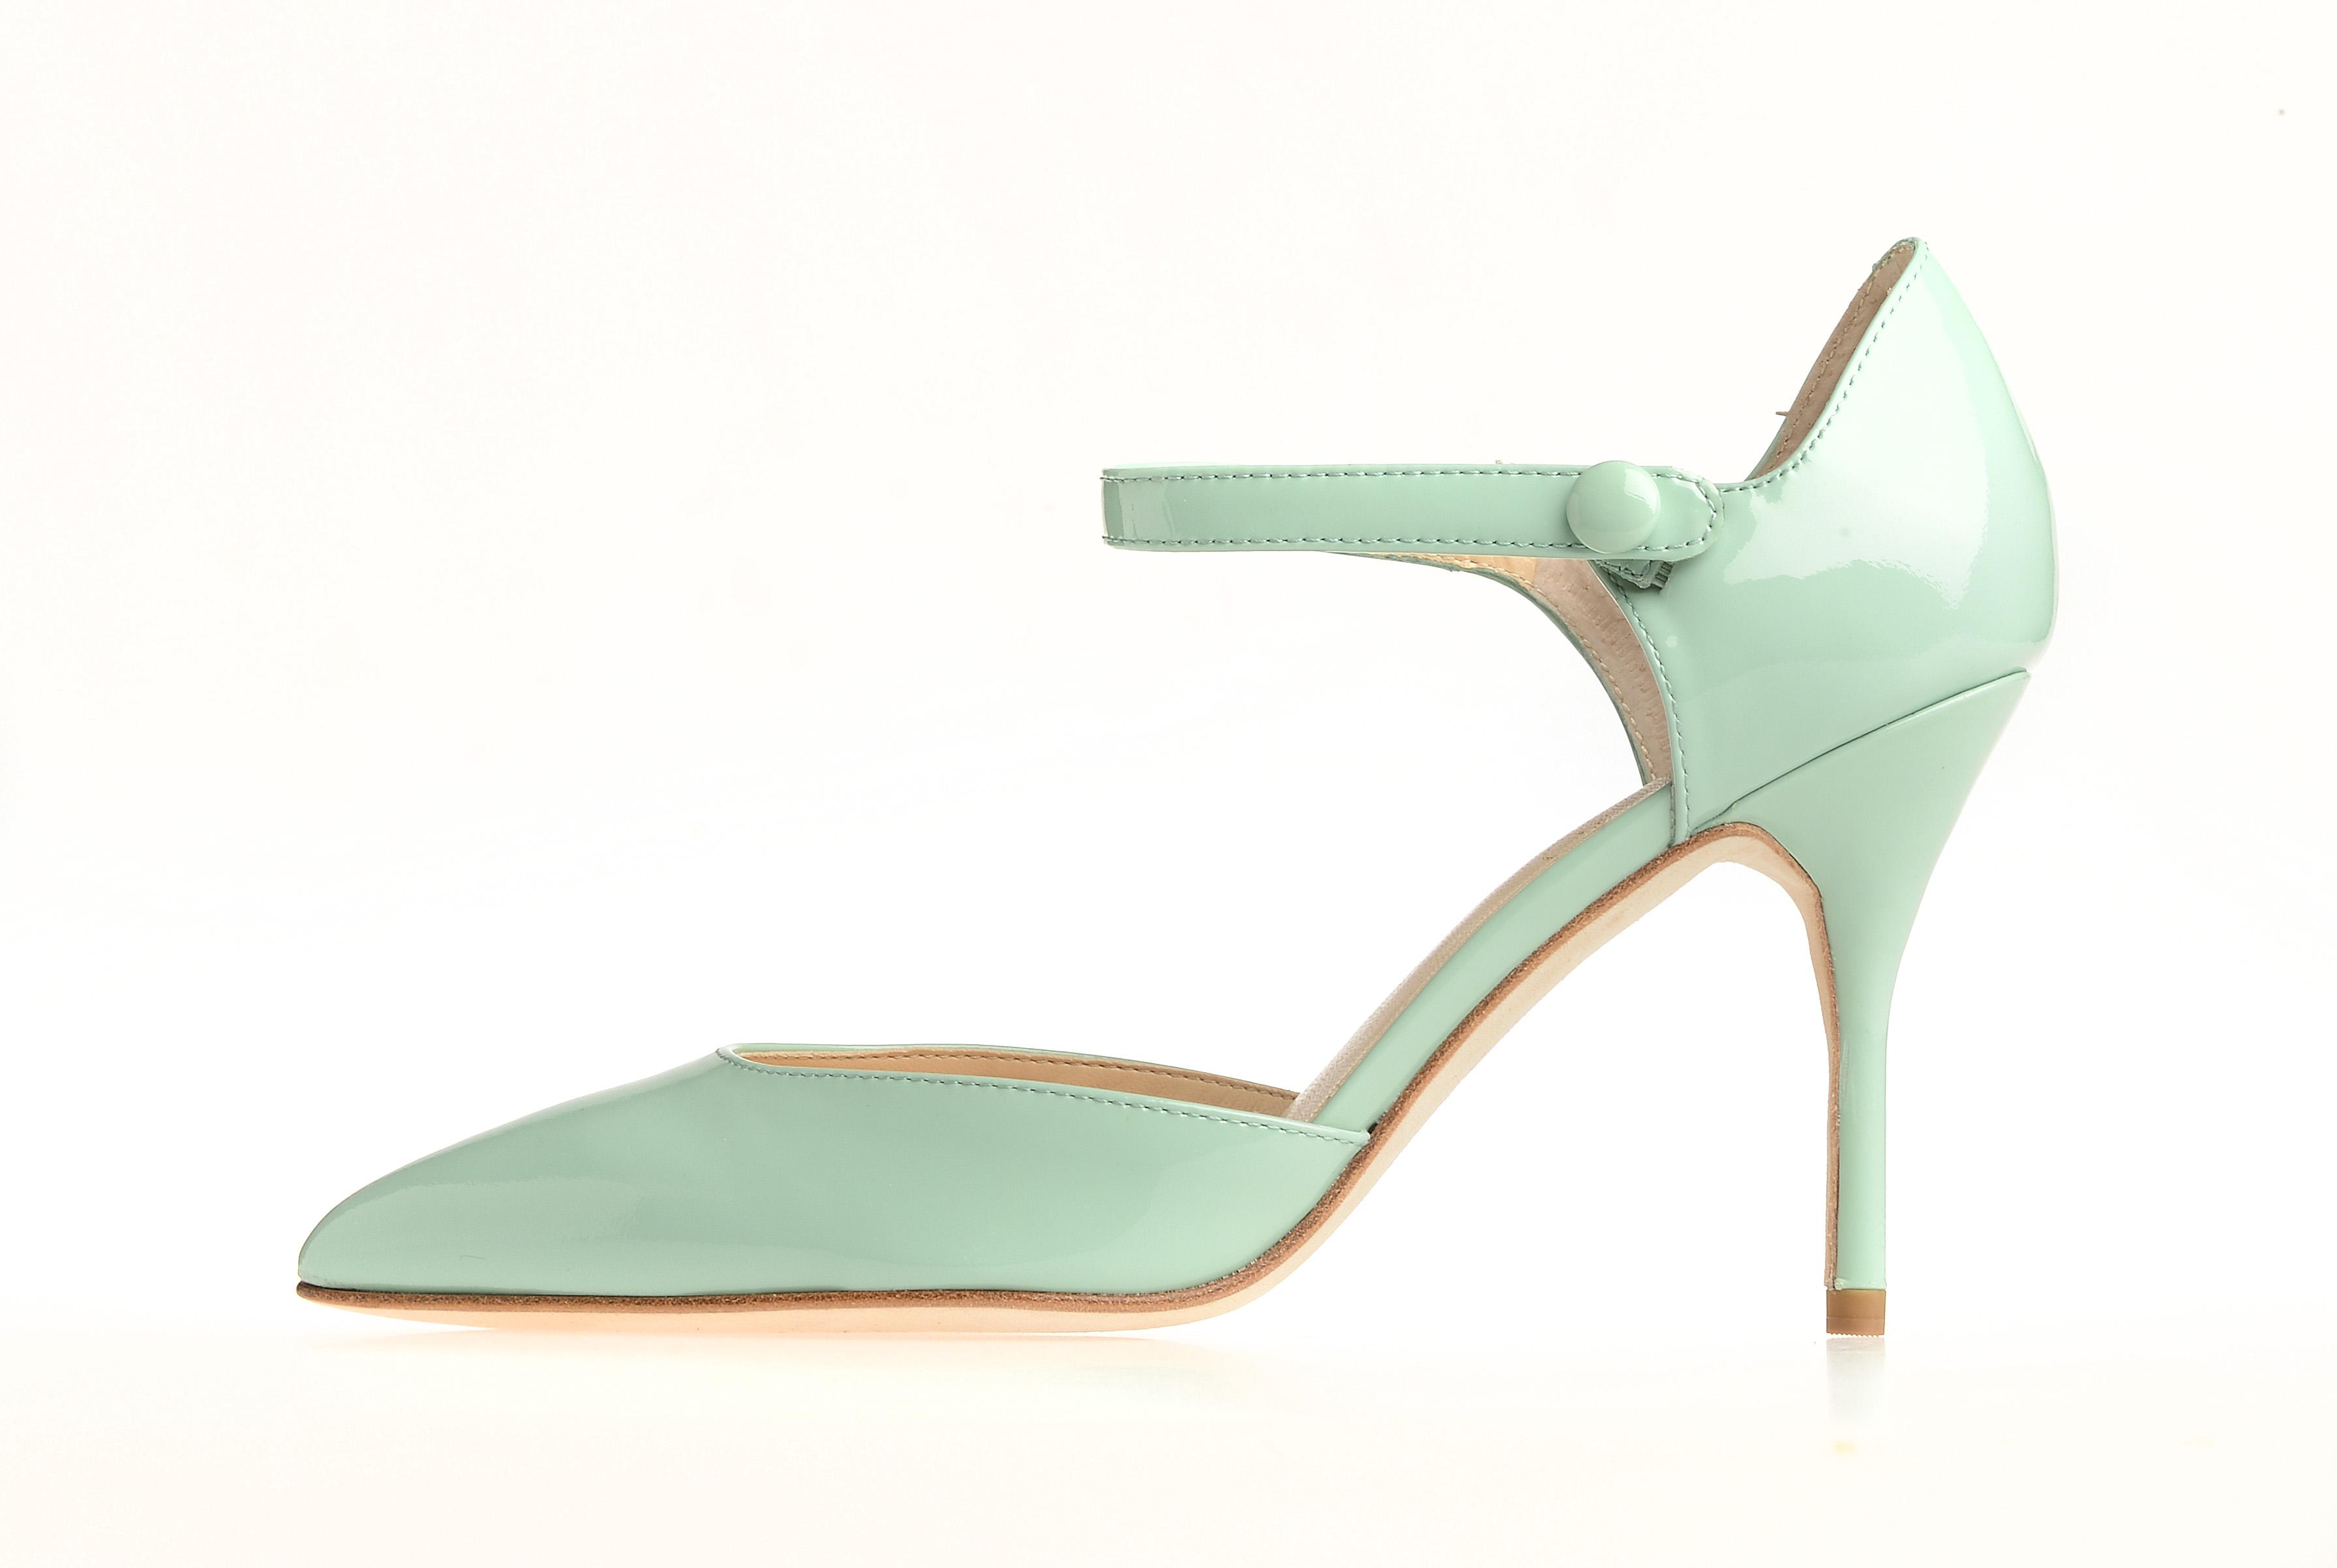 An Ivanka Trump shoe